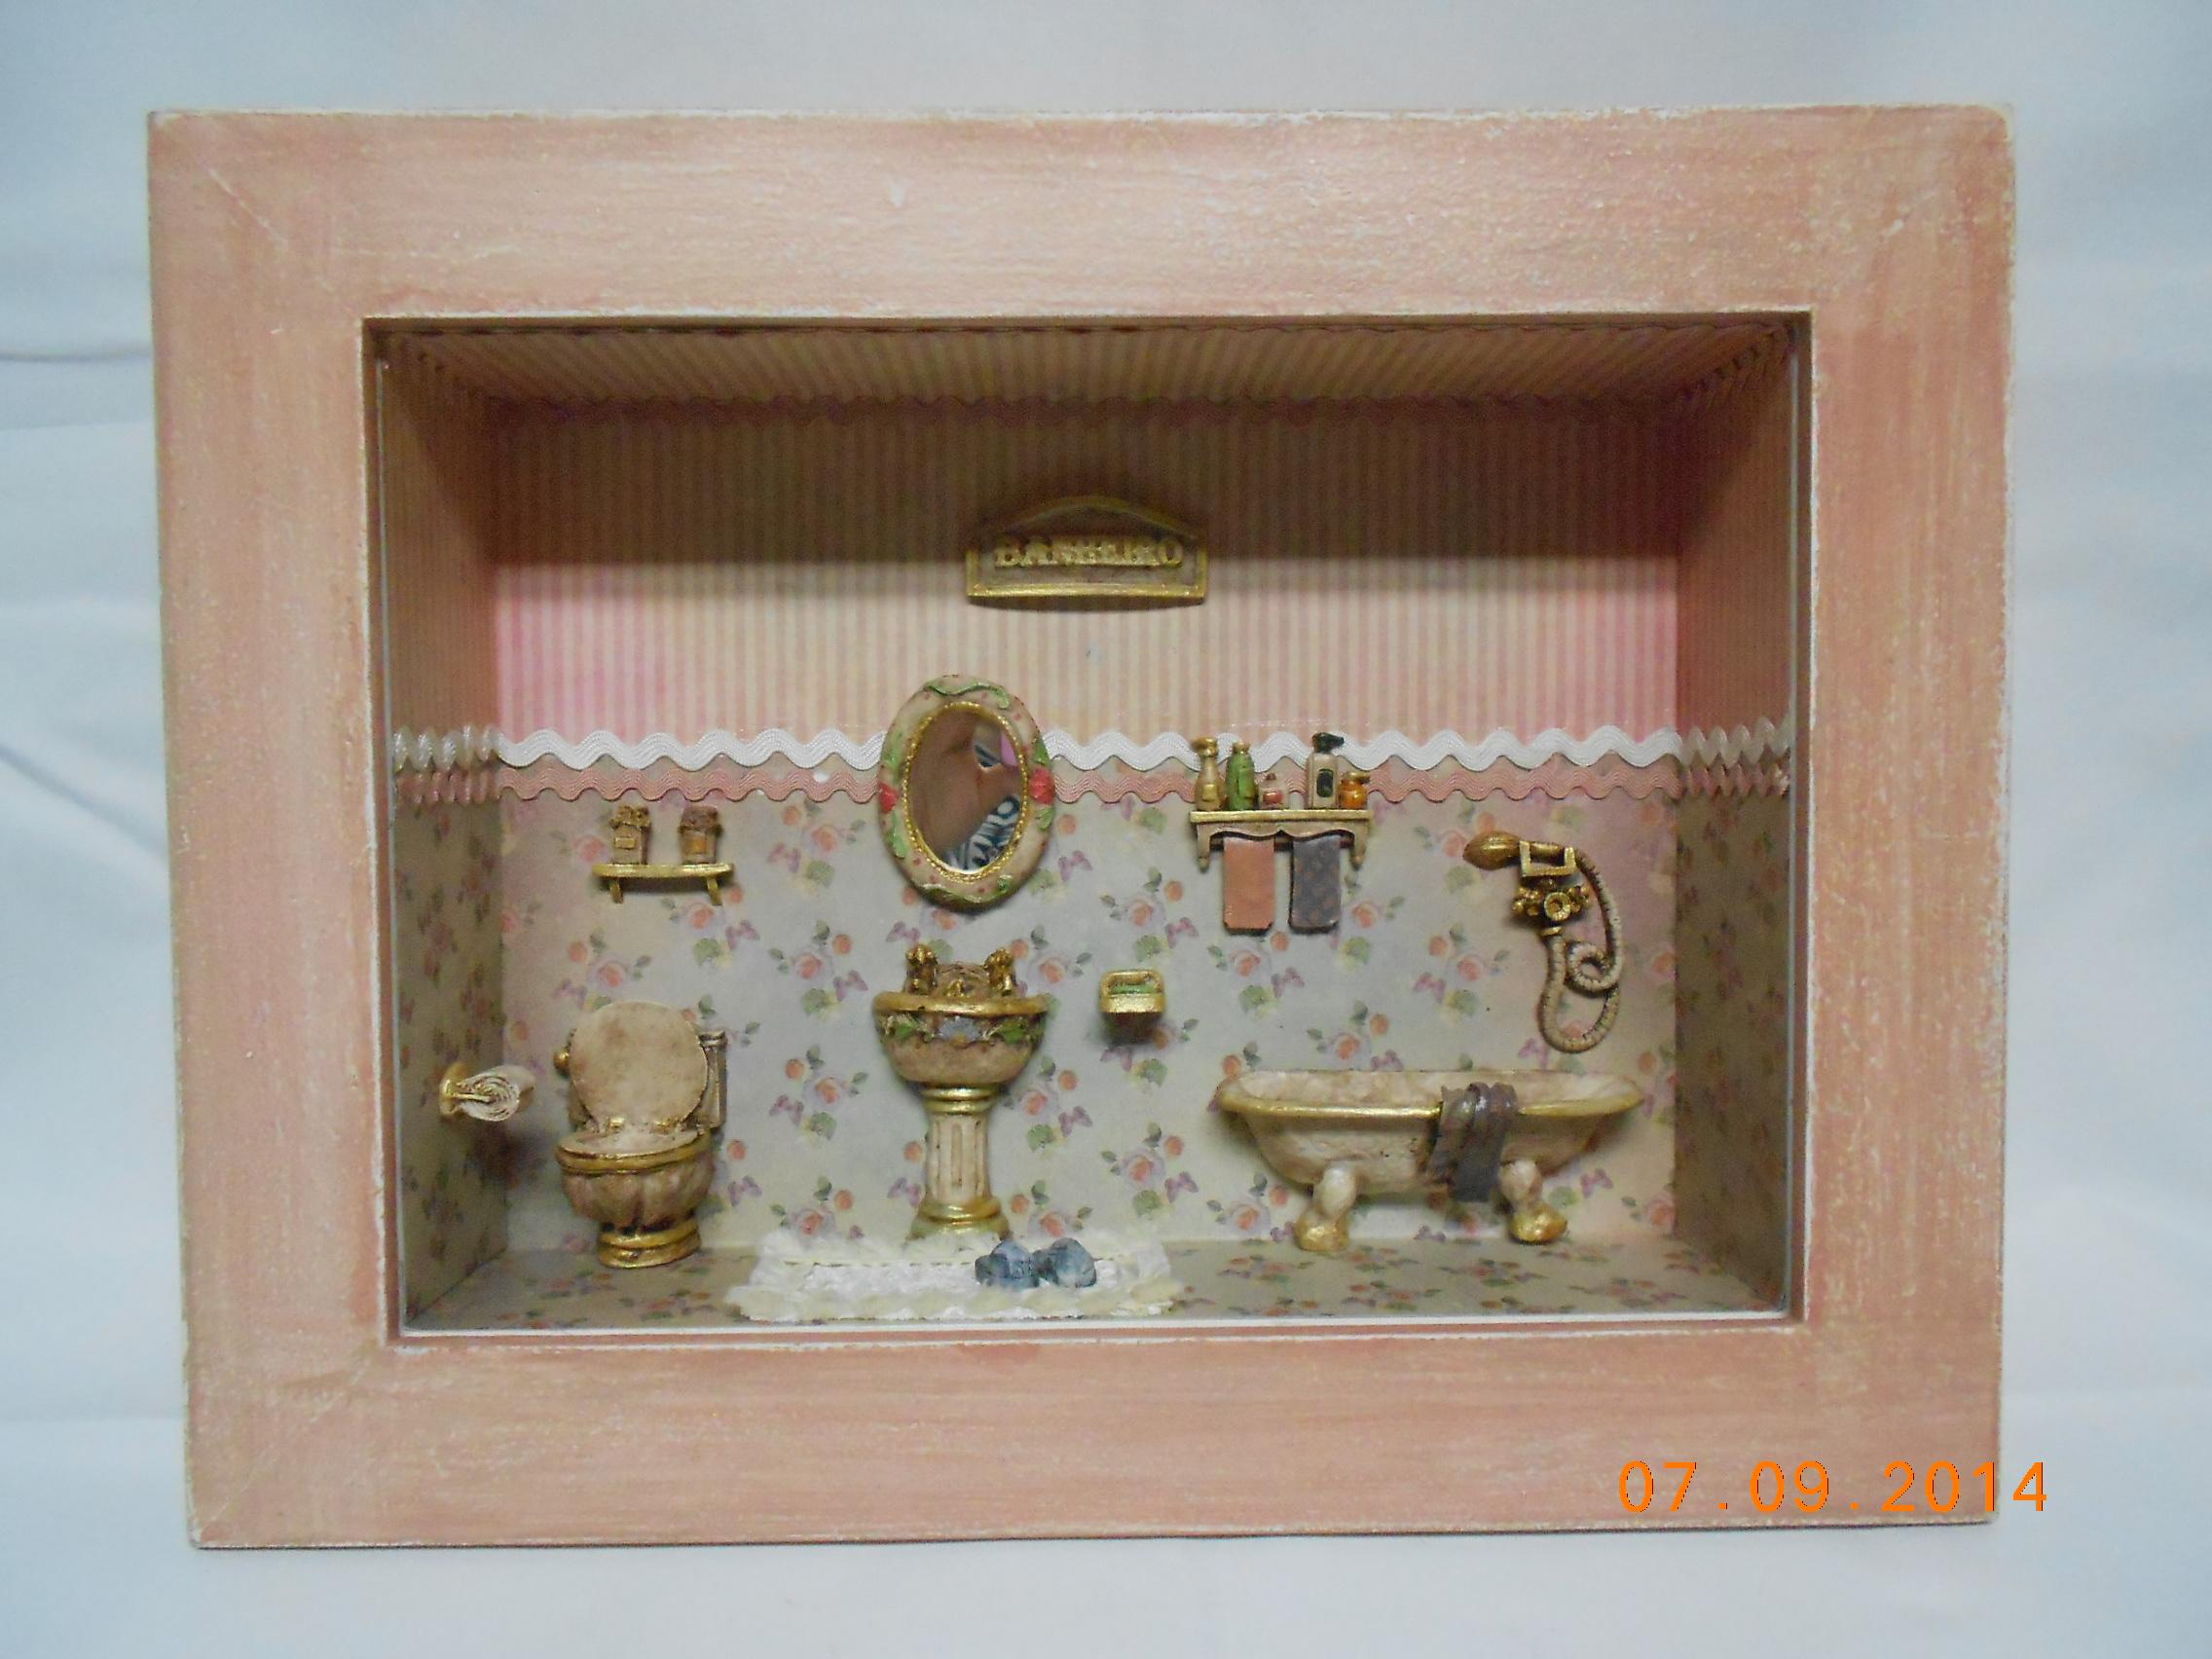 cenario banheiro vintage decoupagem cenario banheiro vintage  #B15F1A 2272x1704 Banheiro Americano